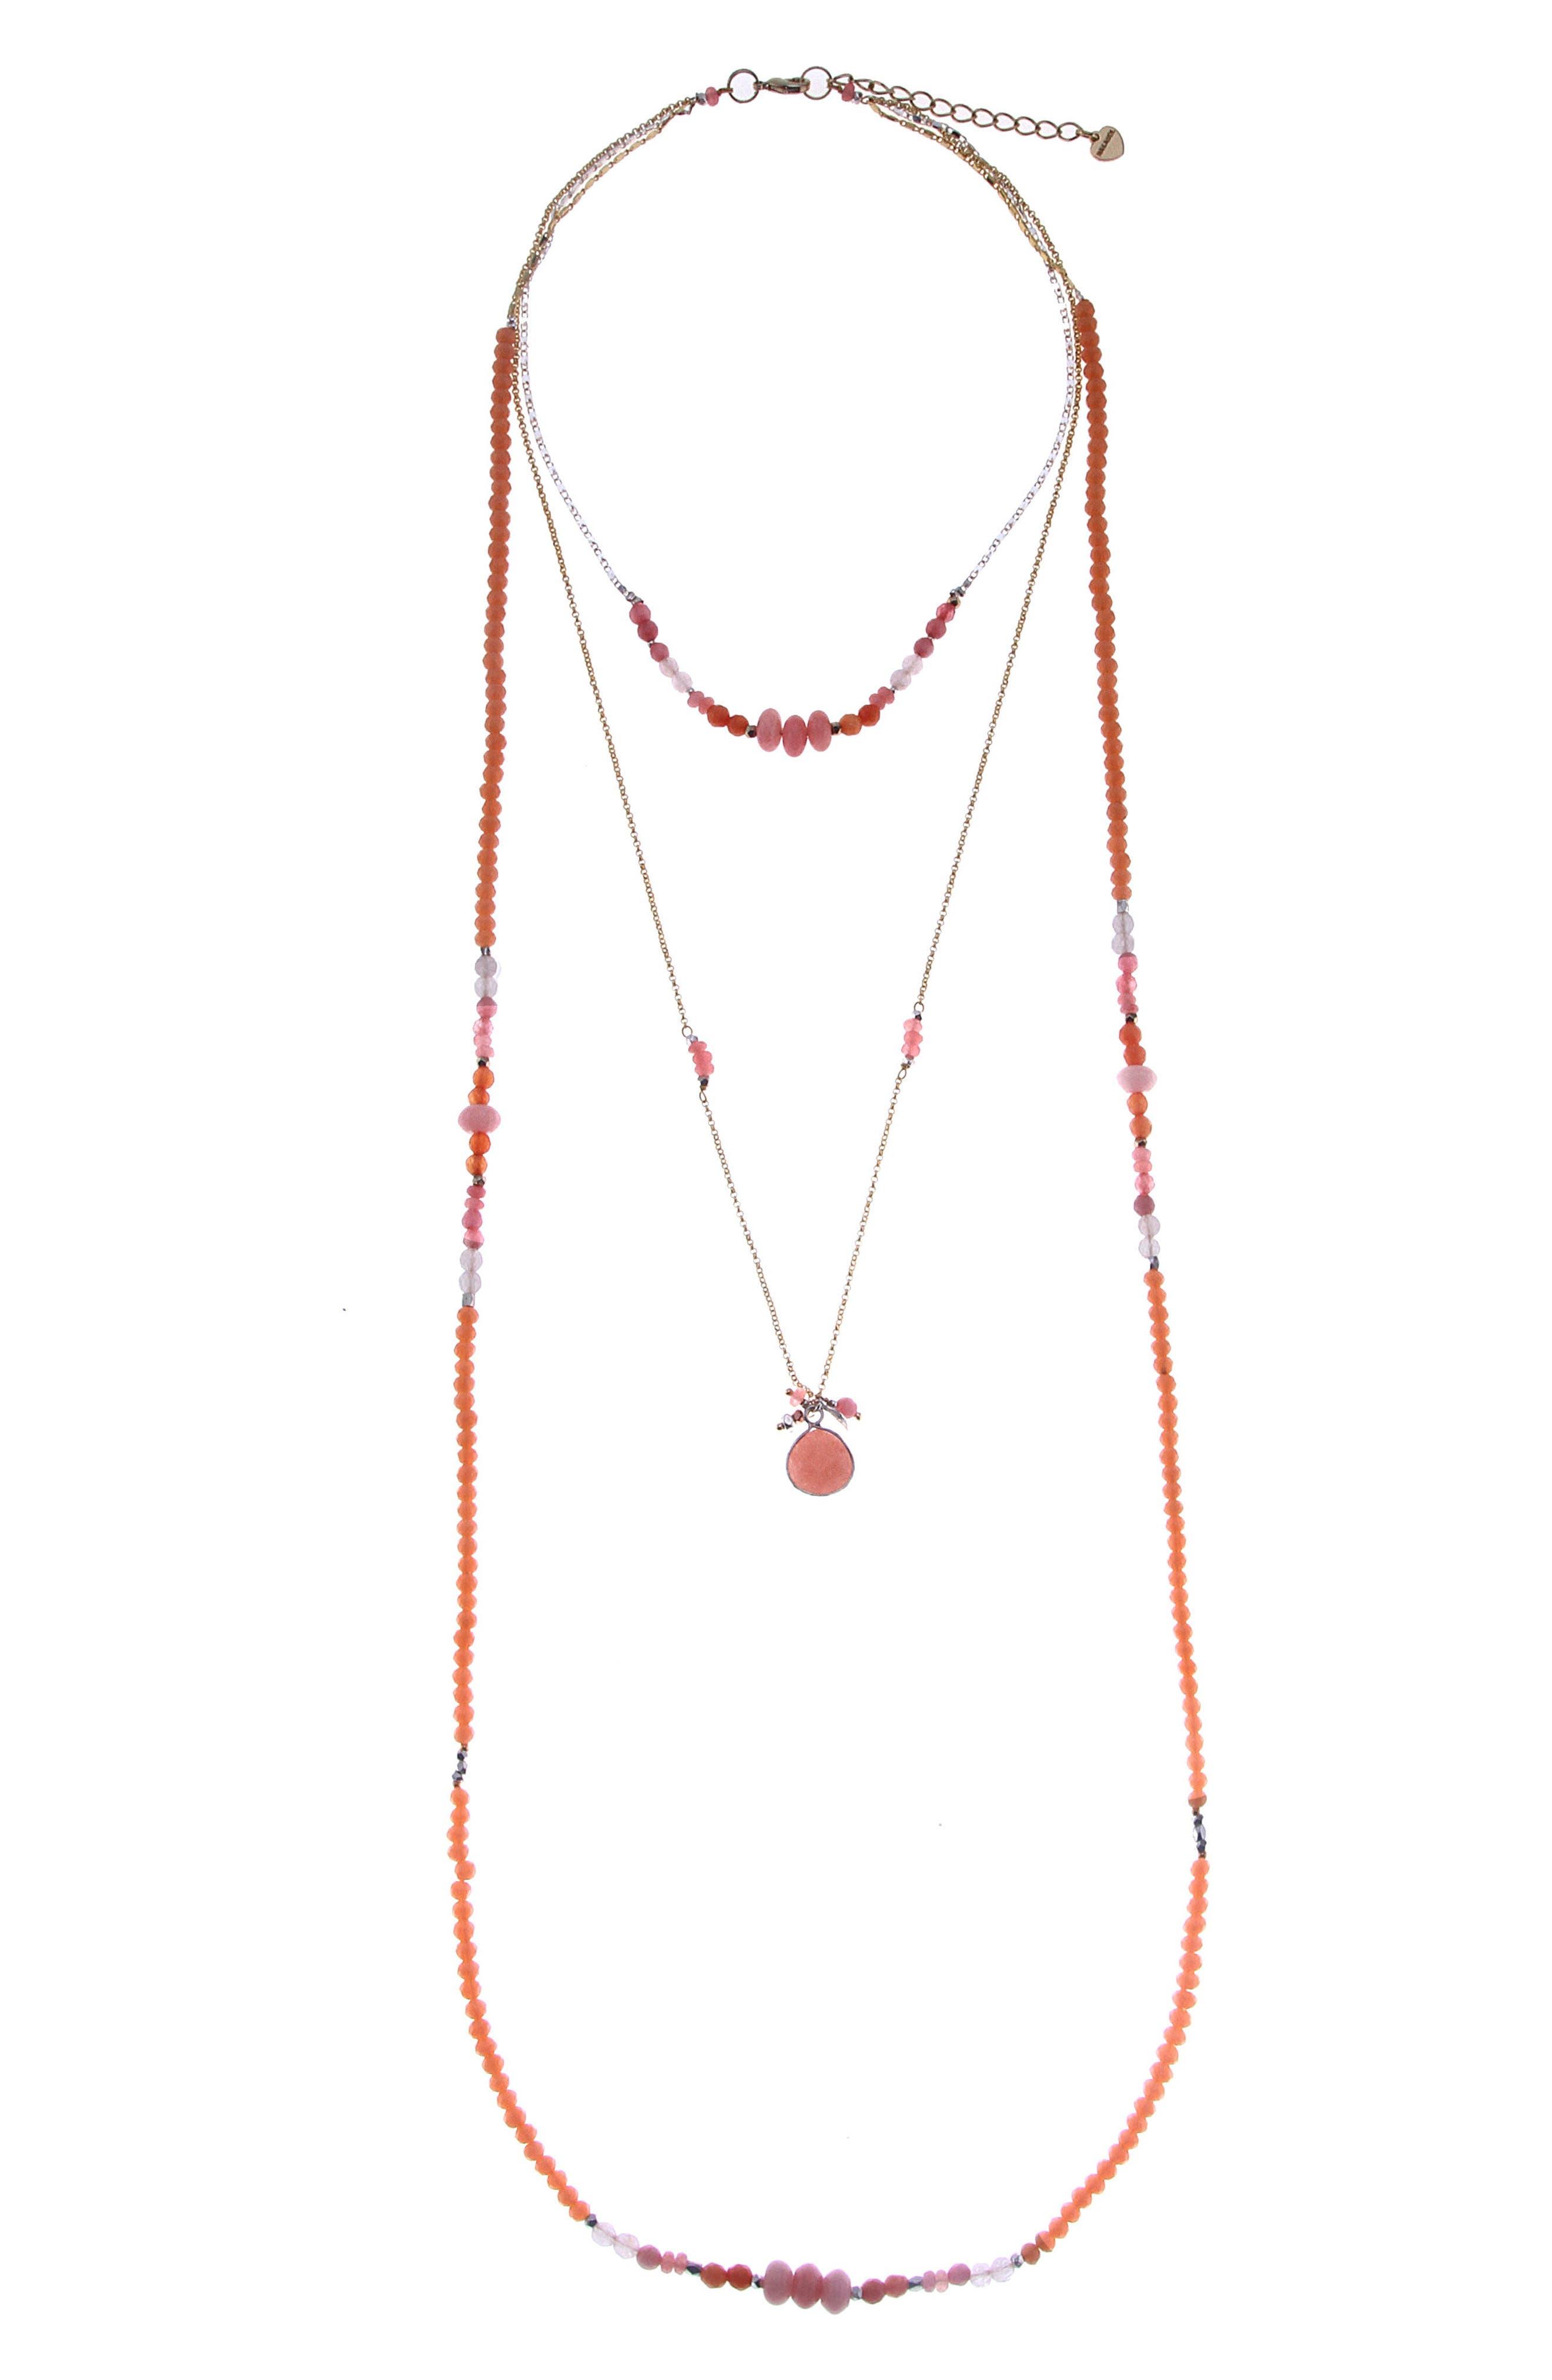 Main Image - Nakamol Design Layered Crystal & Drusy Necklace